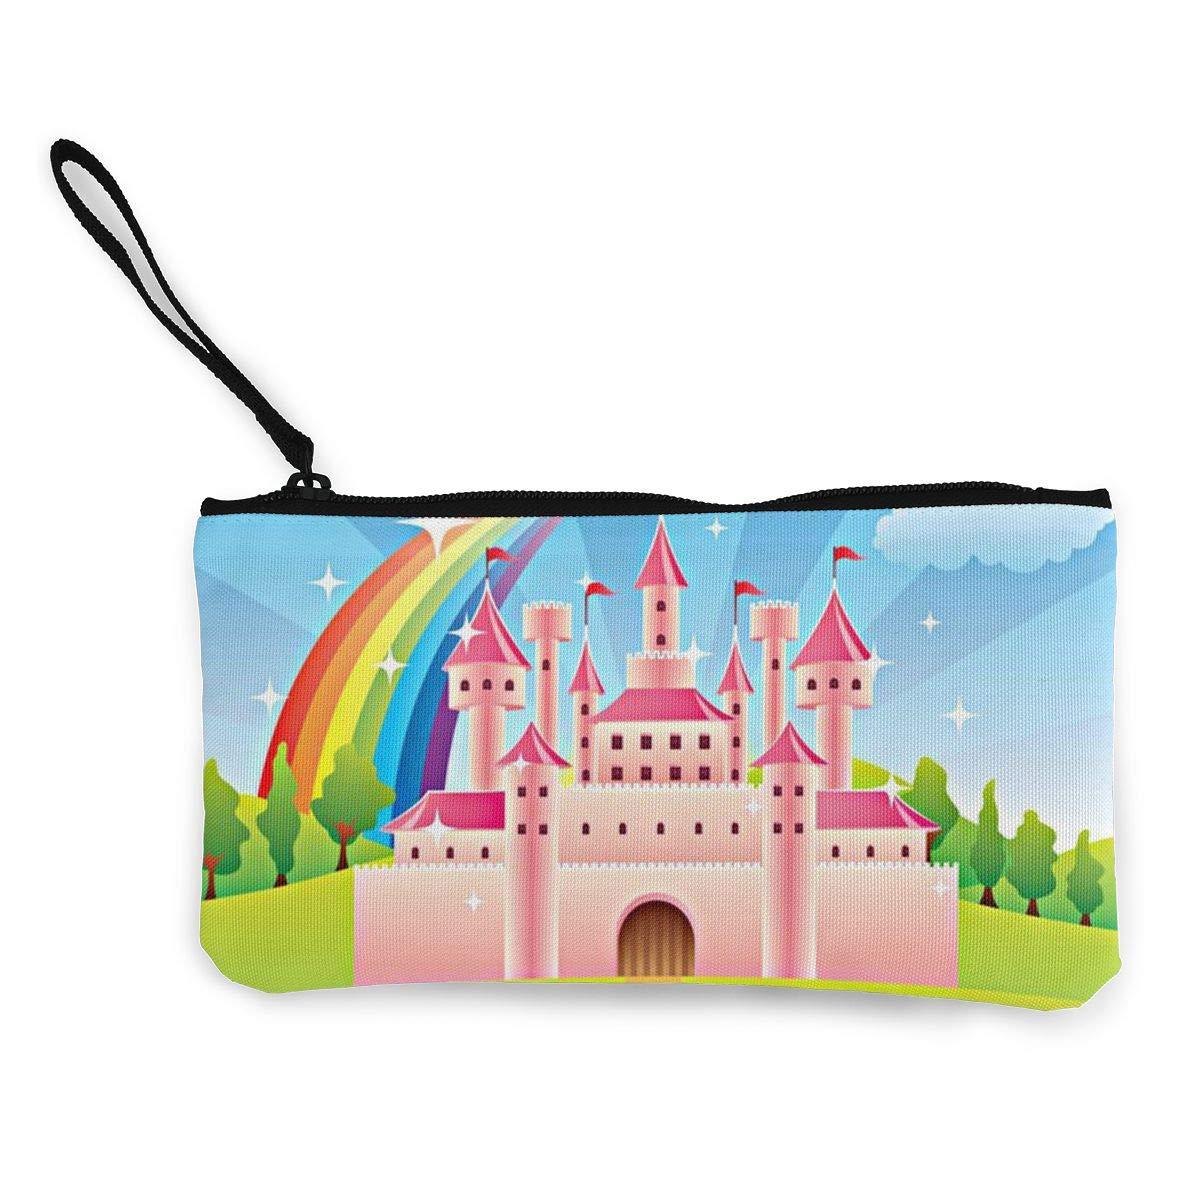 Maple Memories Castle Rainbow Portable Canvas Coin Purse Change Purse Pouch Mini Wallet Gifts For Women Girls